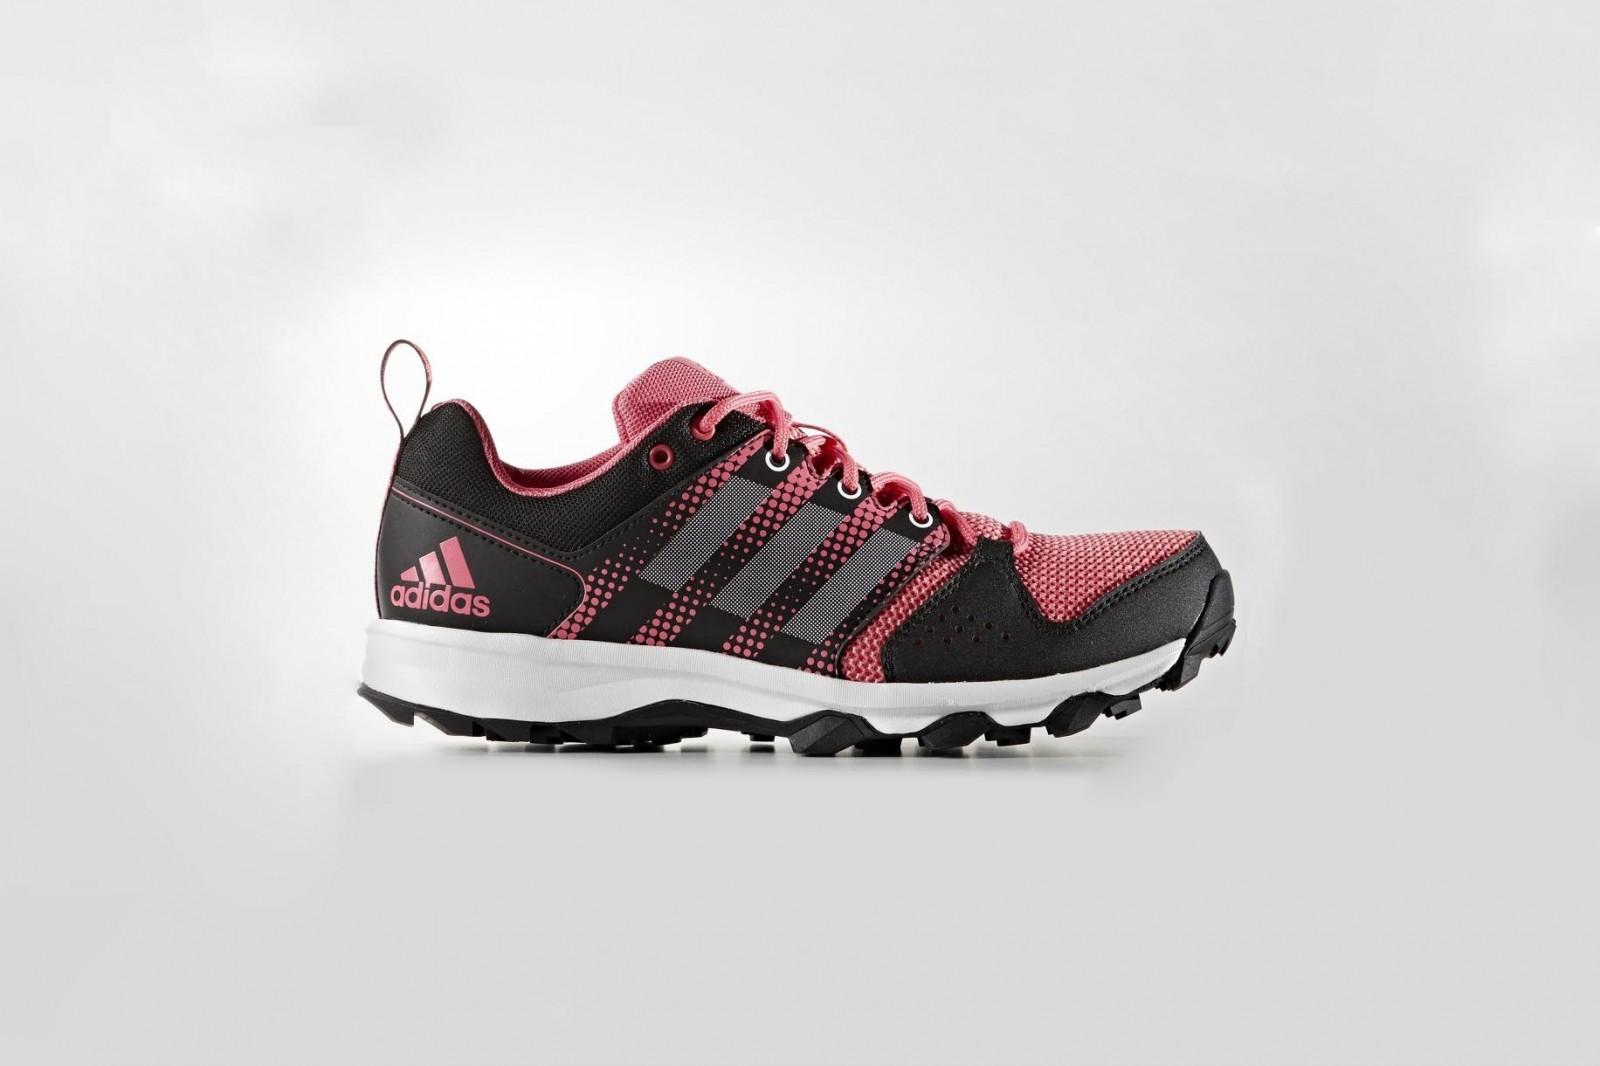 Dámské běžecké boty adidas Performance Galaxy Trail W